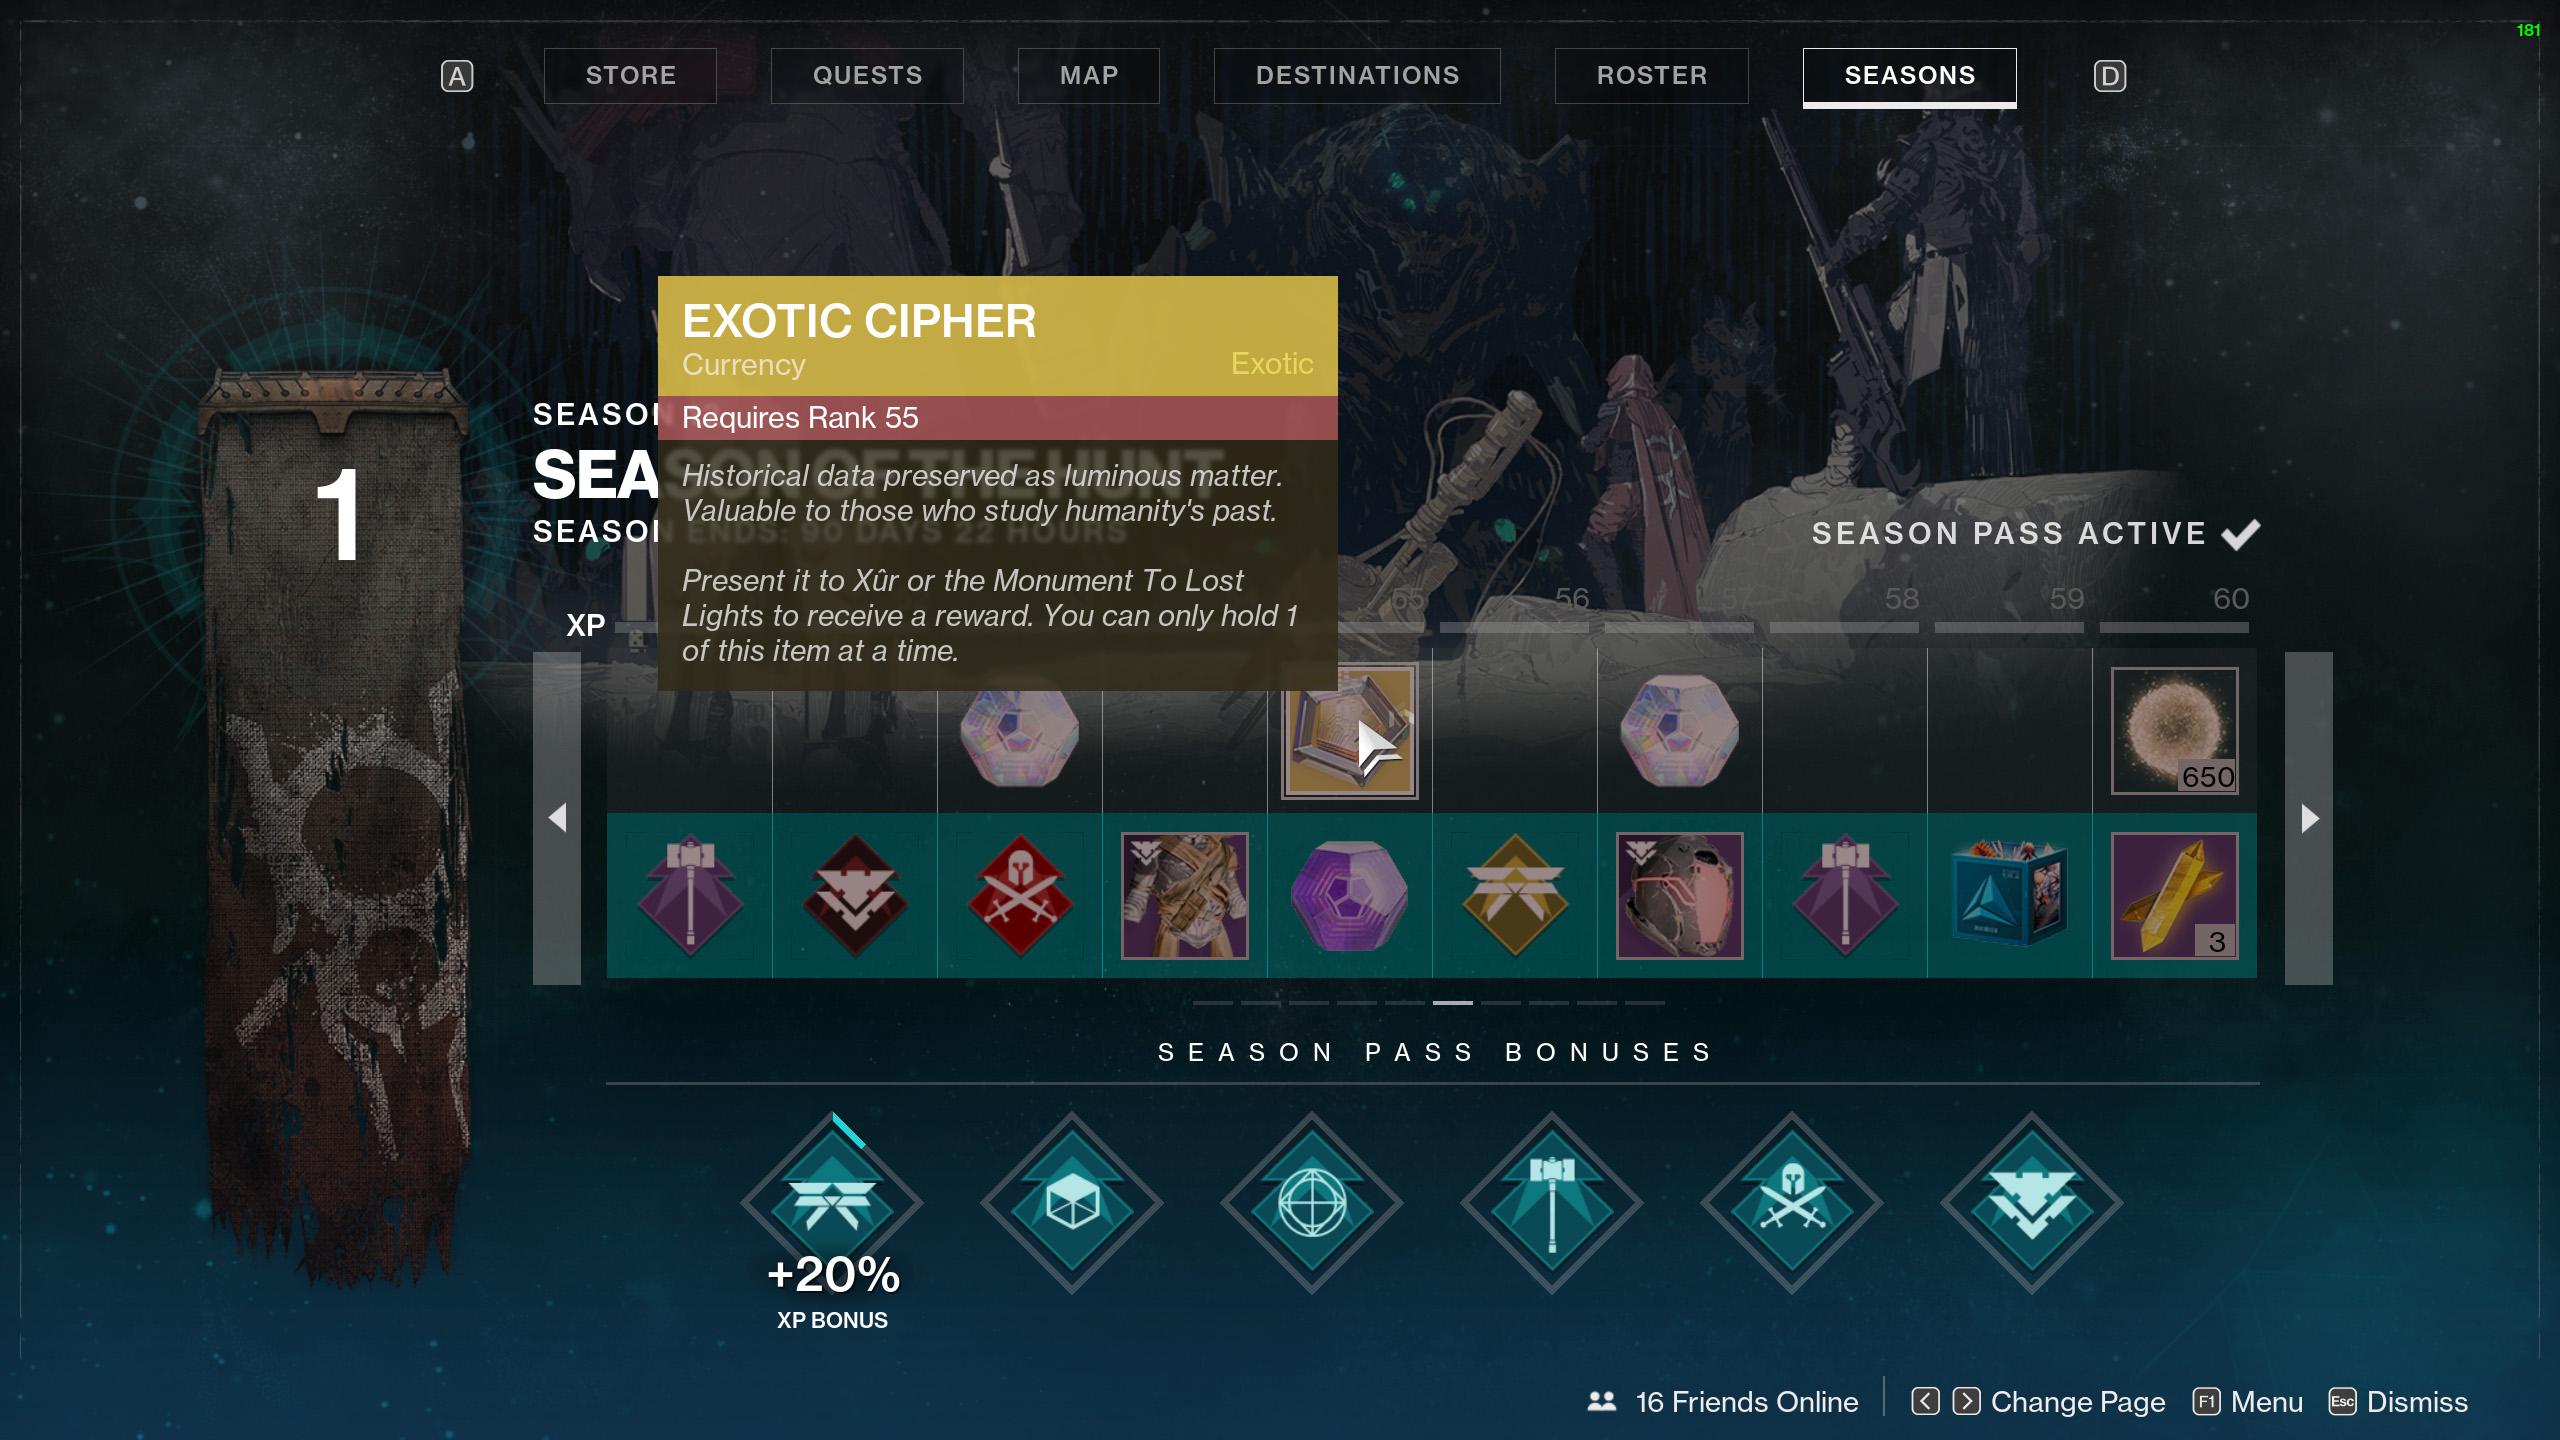 destiny 2 get exotic cipher